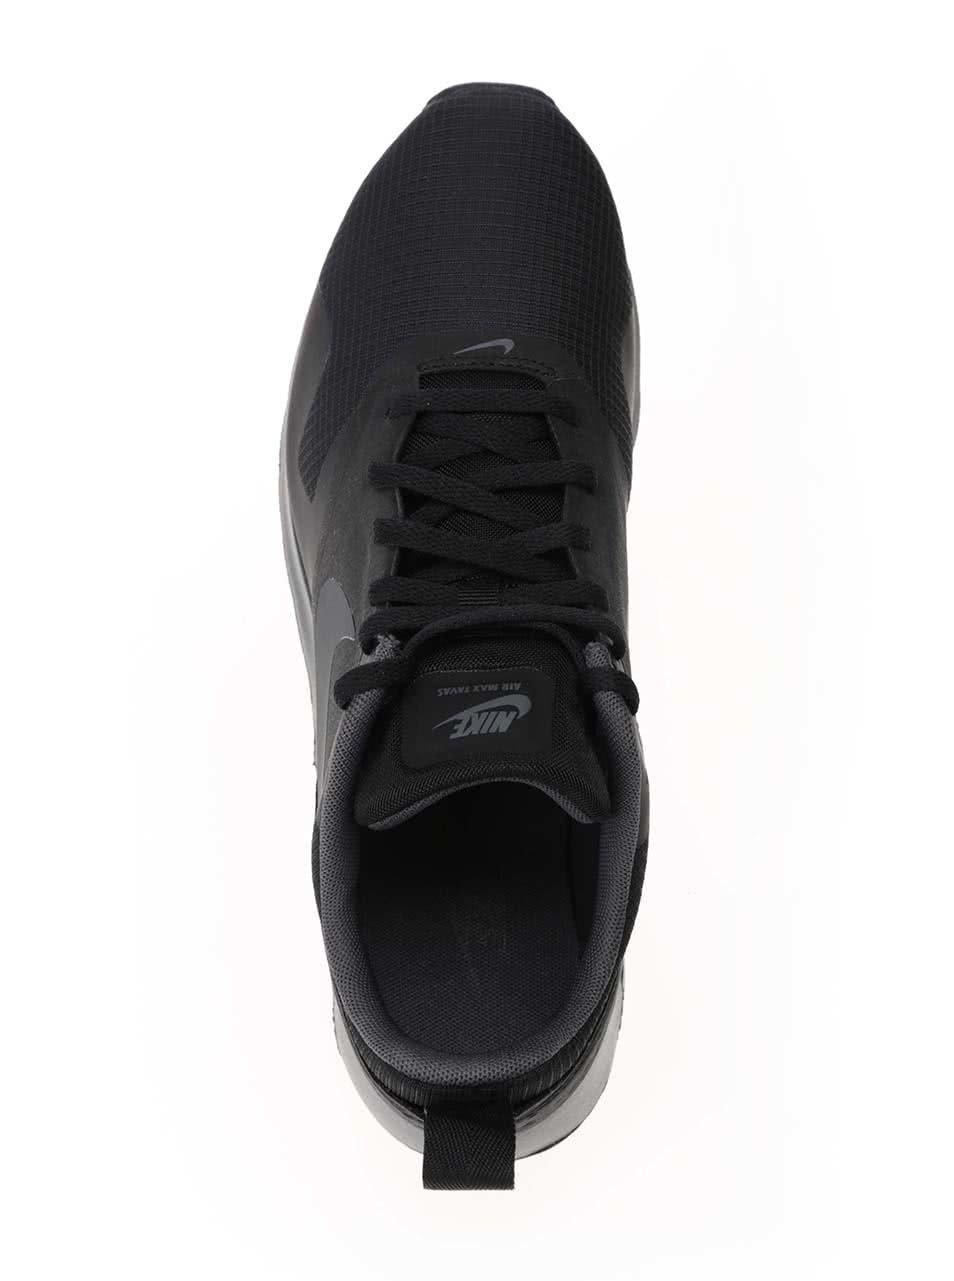 aacb88e0c98 Černé pánské tenisky Nike Air Max Travas ...